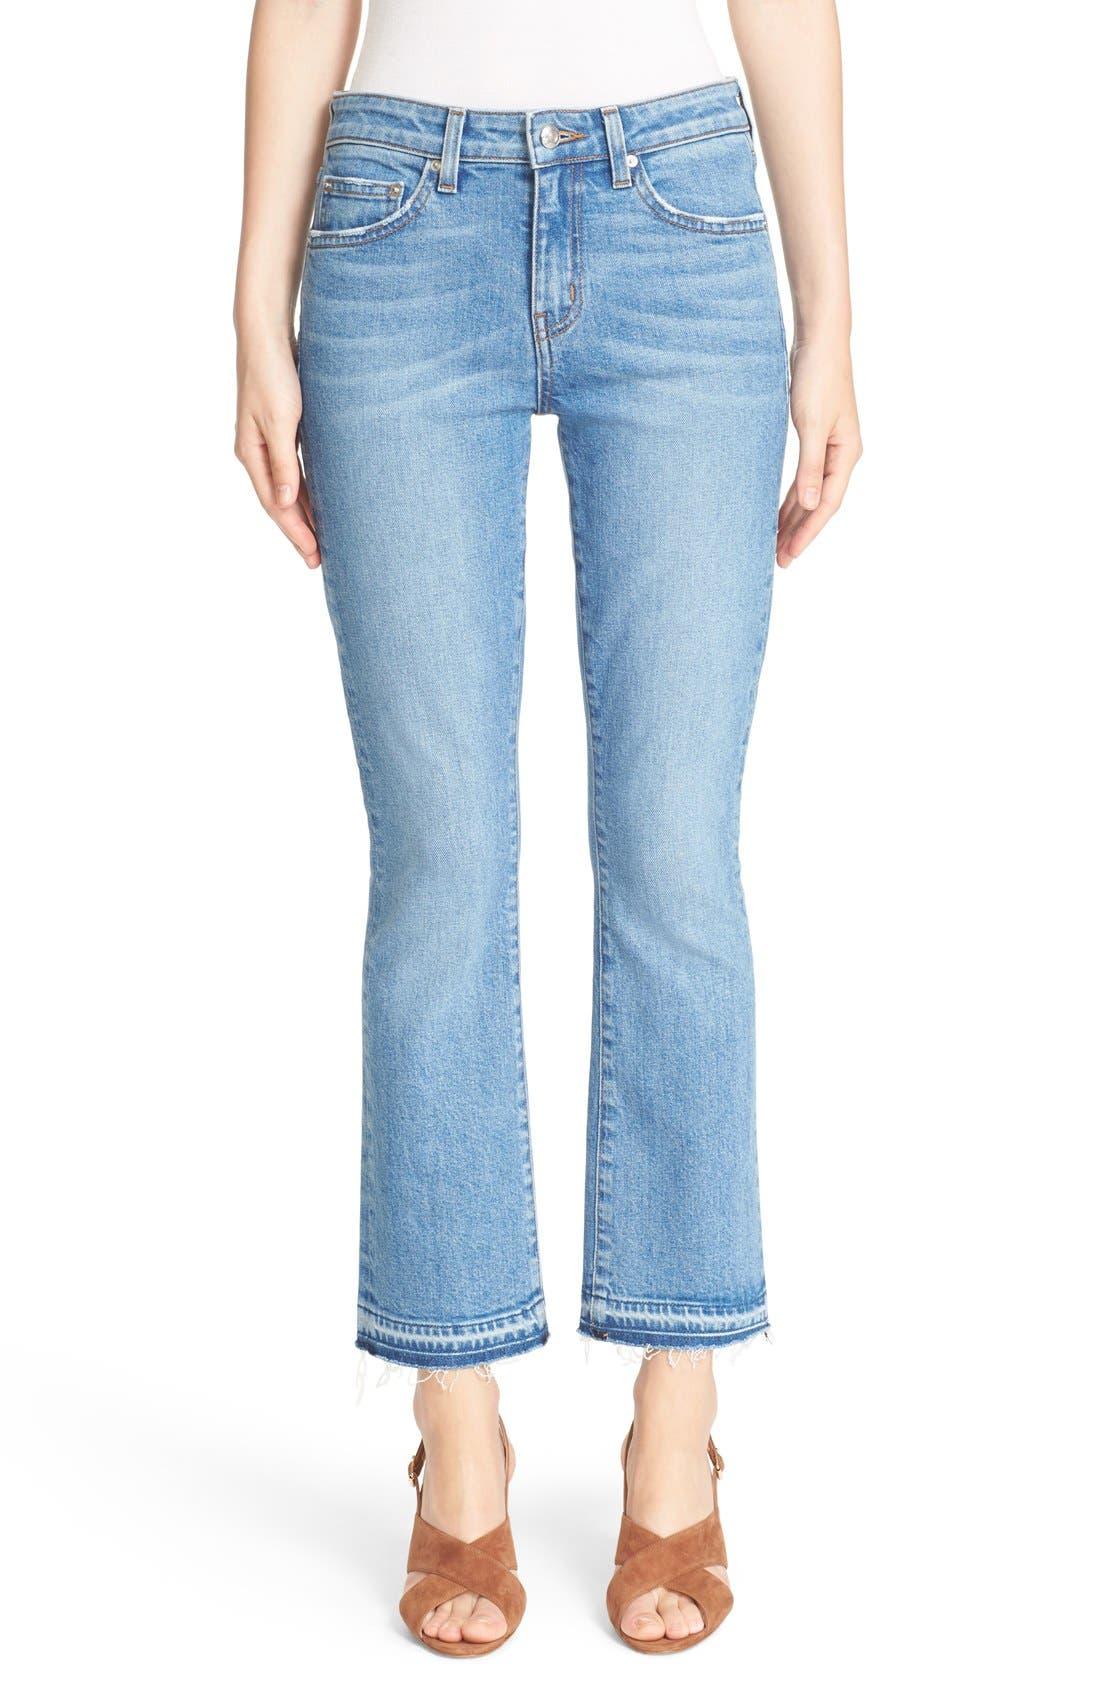 Alternate Image 1 Selected - Derek Lam 10 Crosby 'Gia' Crop Flare Jeans (Light Wash)